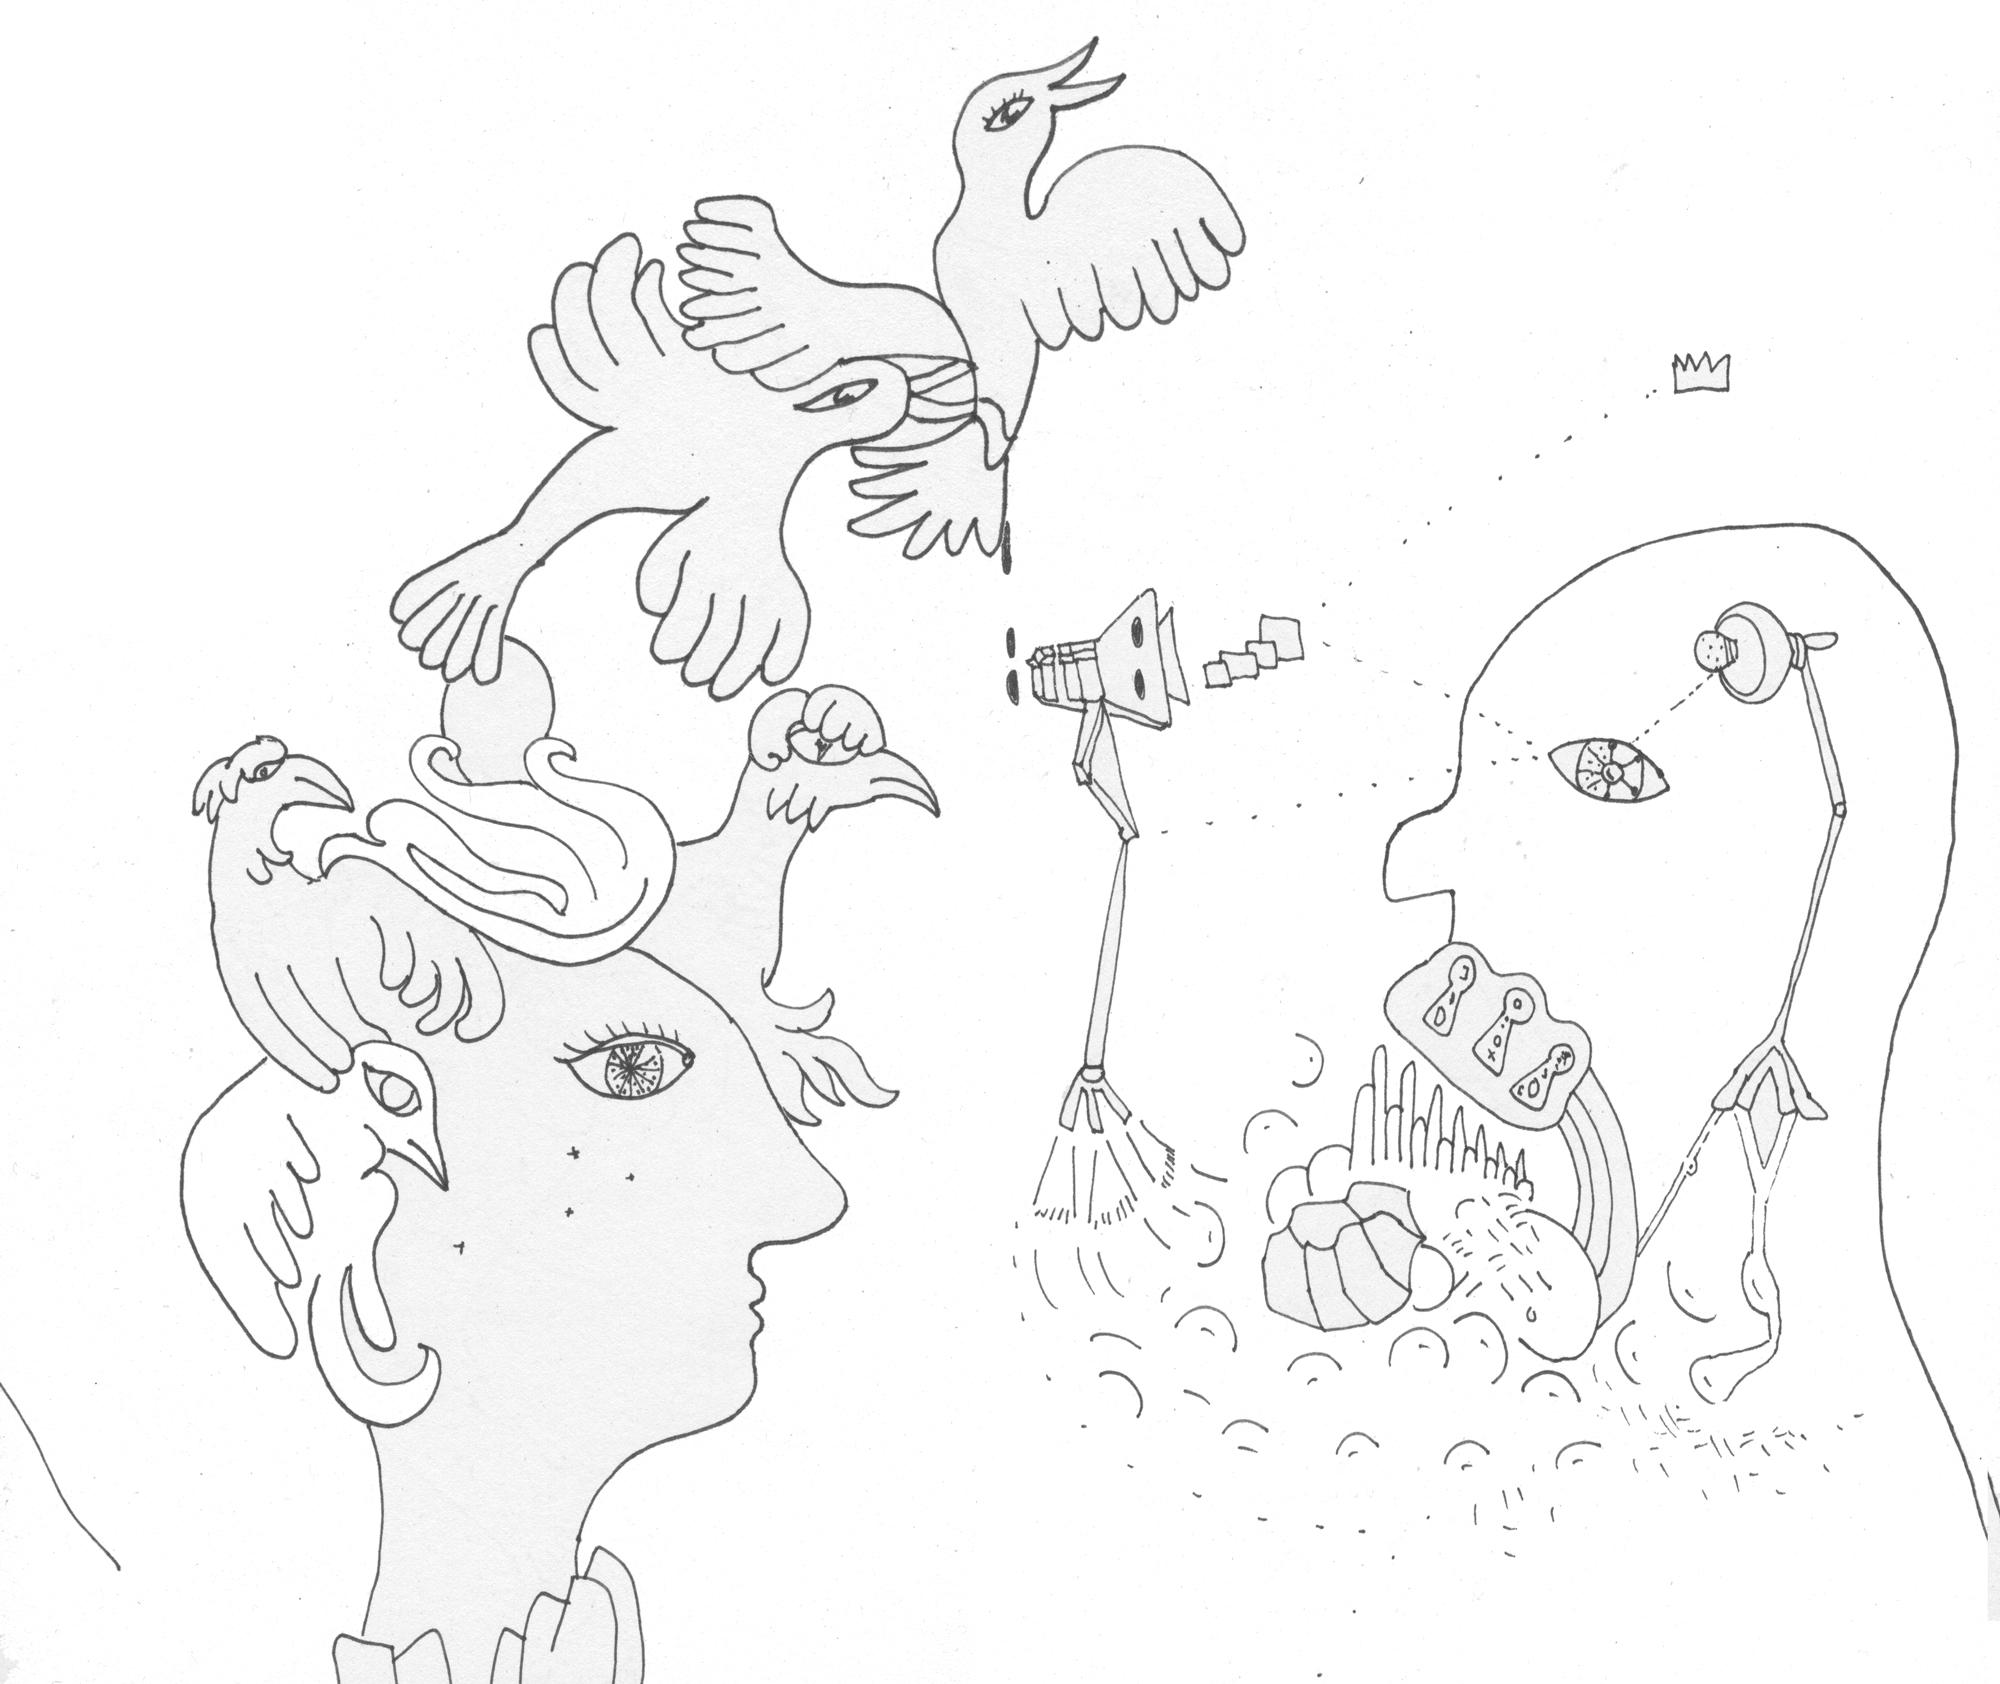 tekening01k